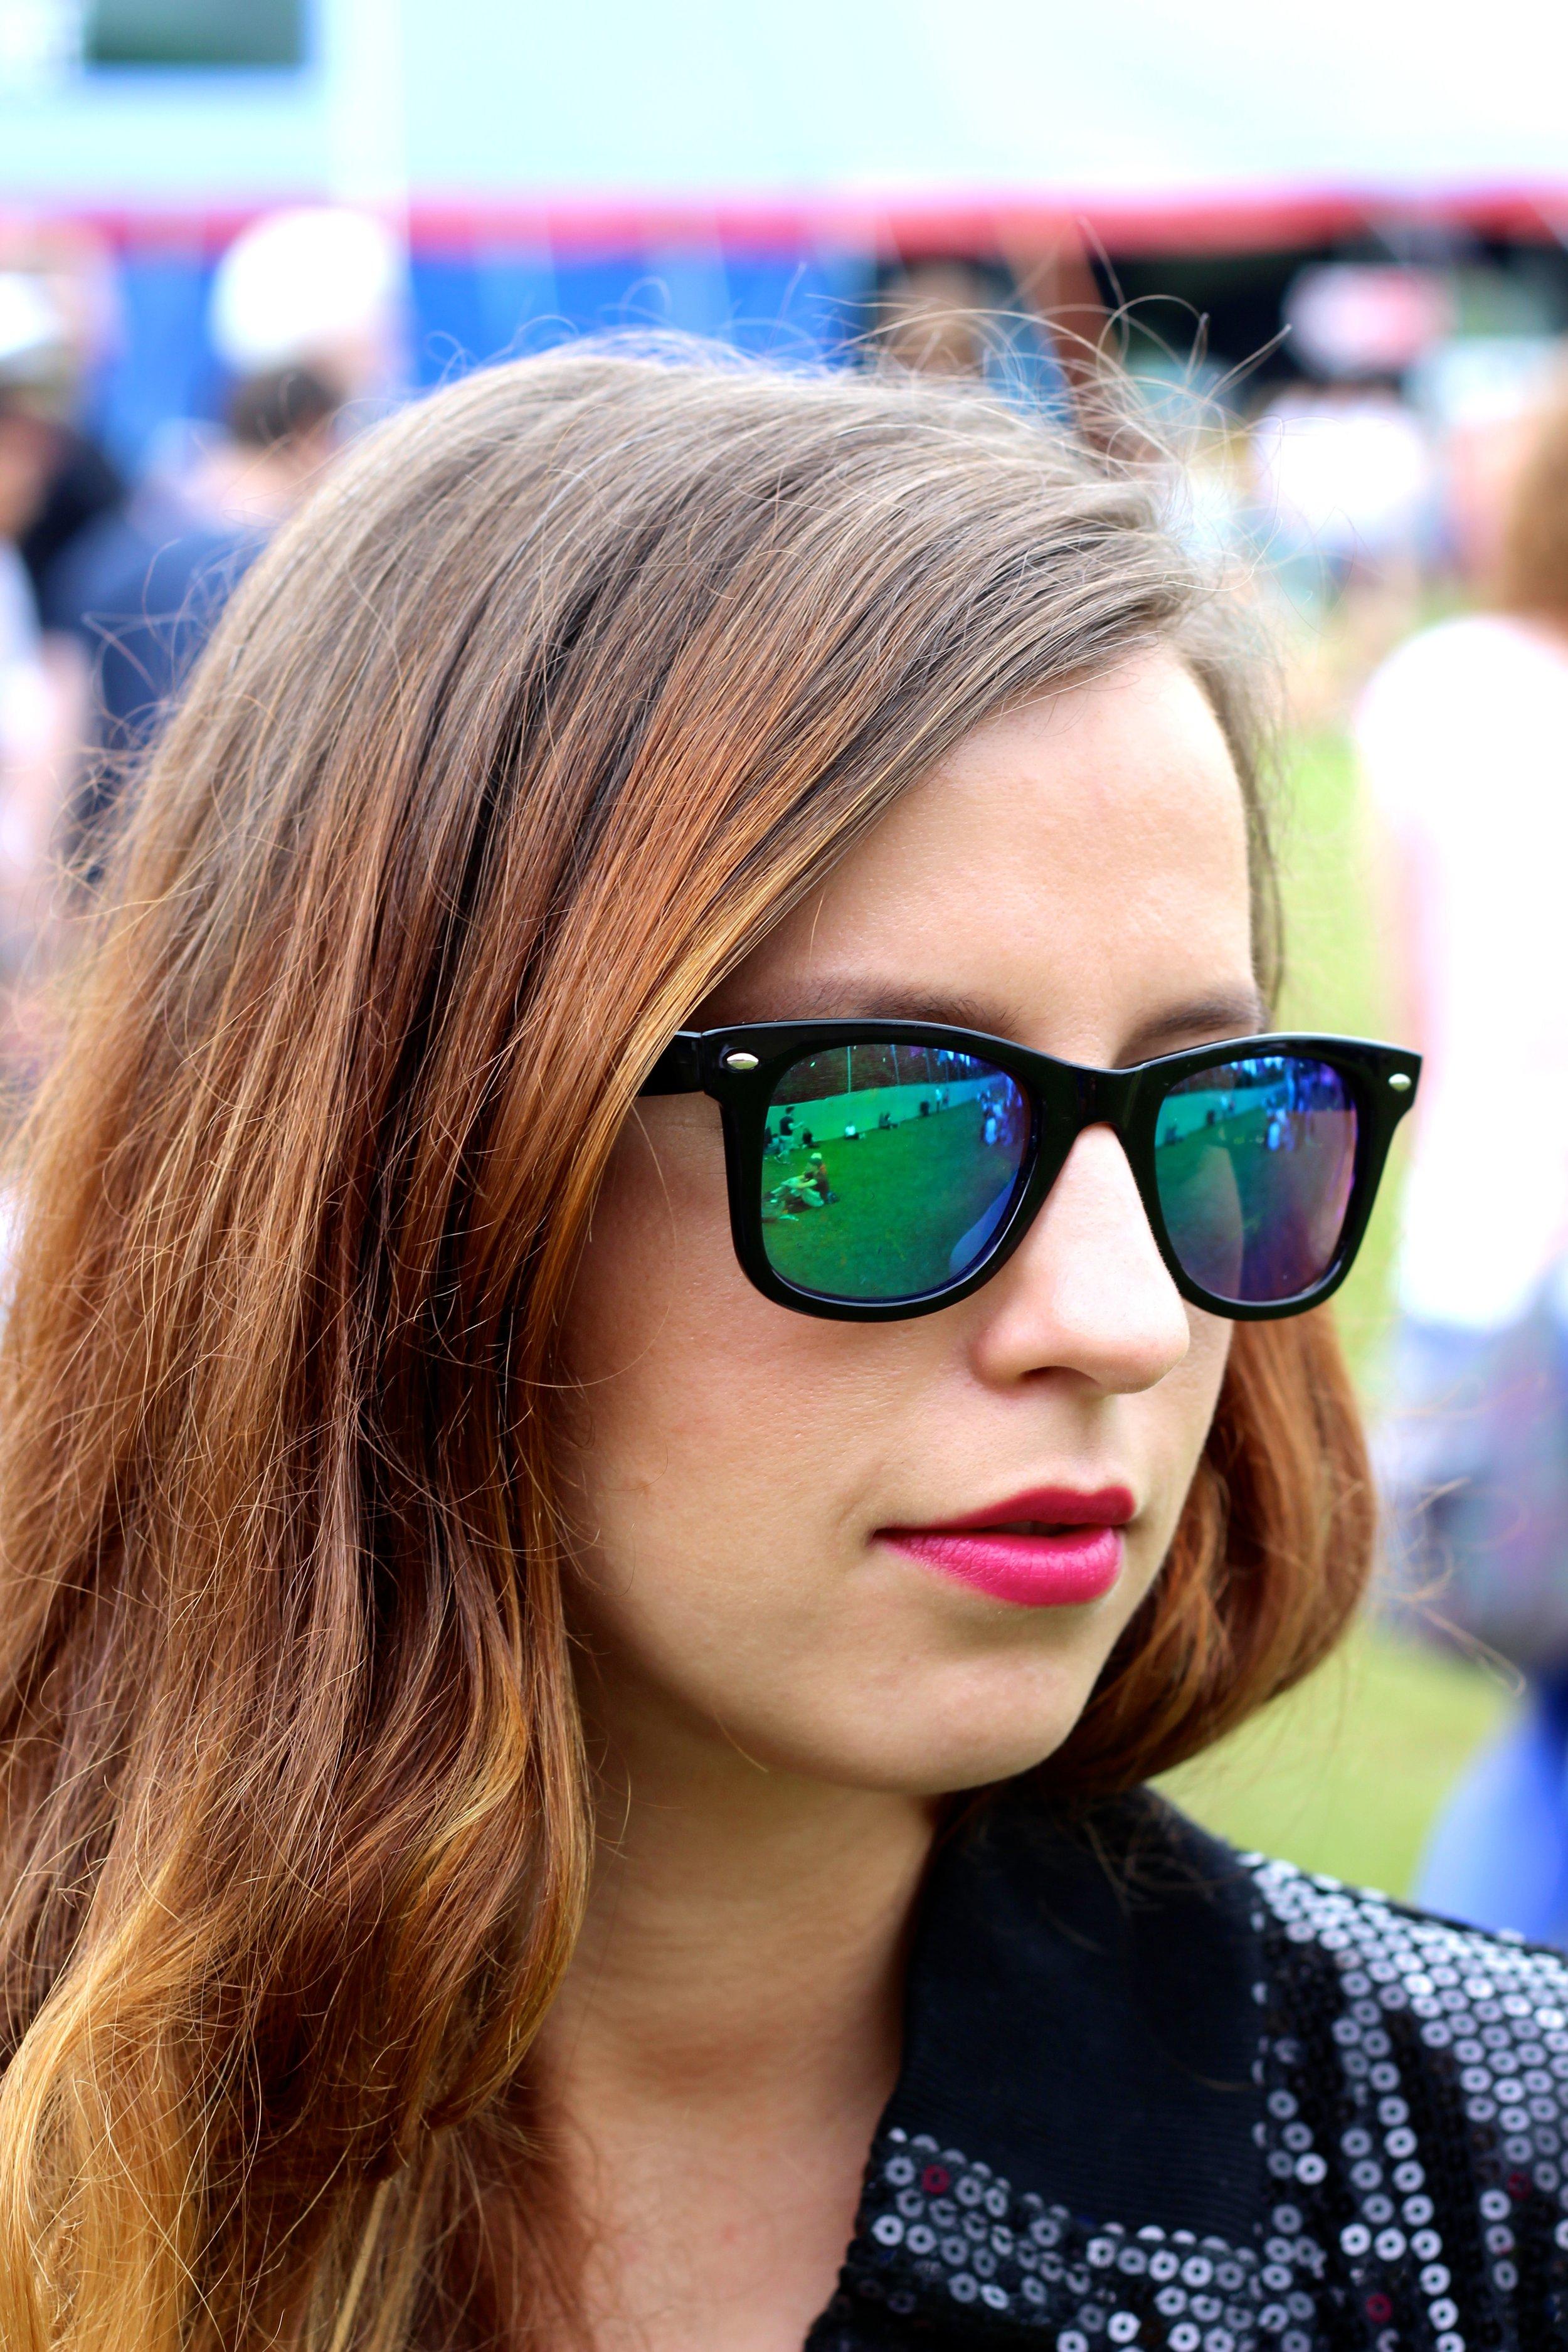 Look 2: Festival Glam